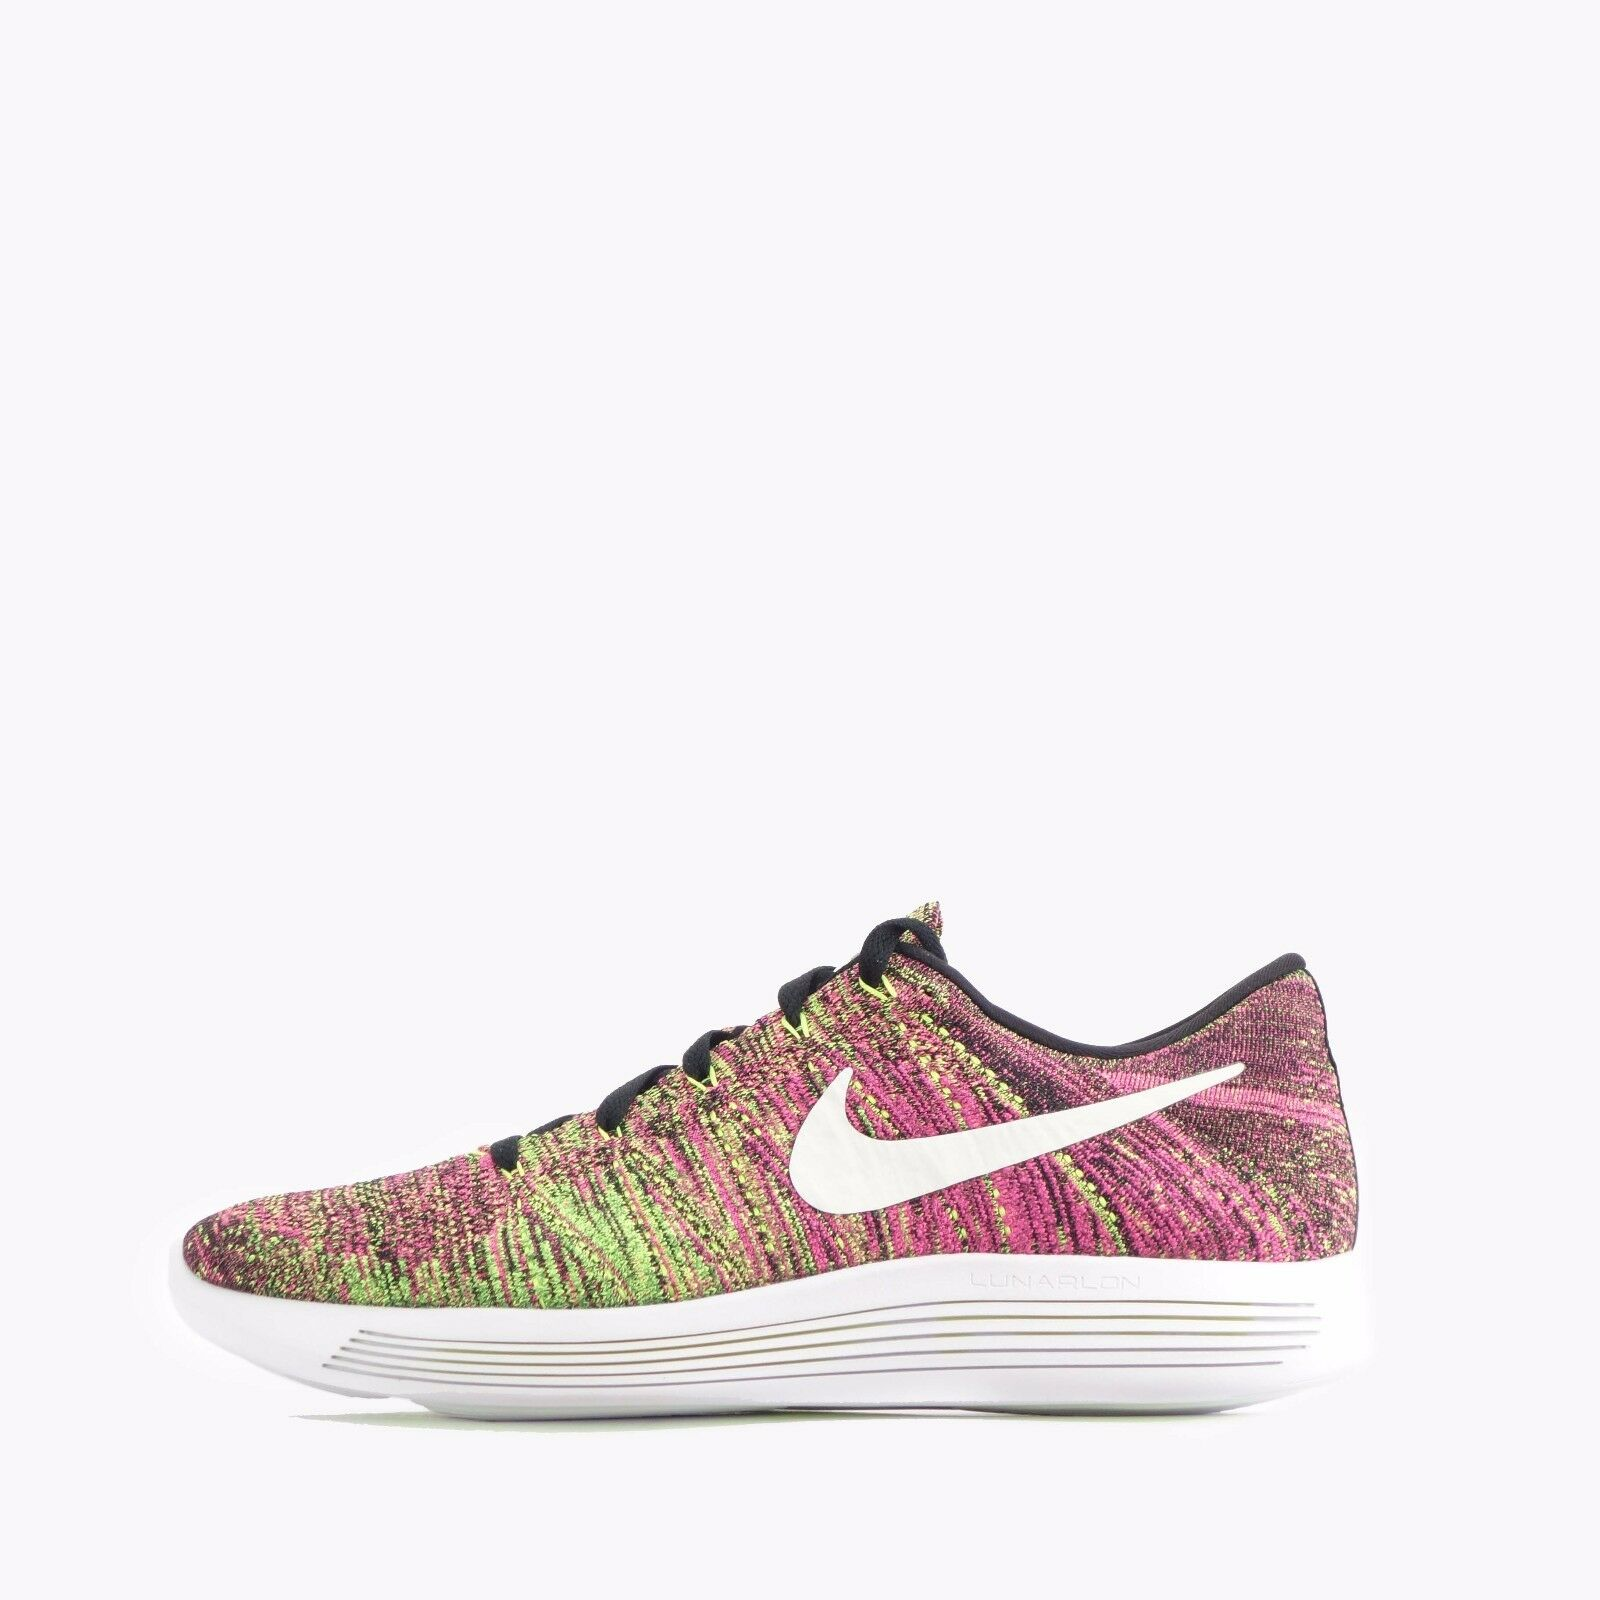 Nike LunarEpic Low Flyknit OC Men's Running Shoes Multicolor/White